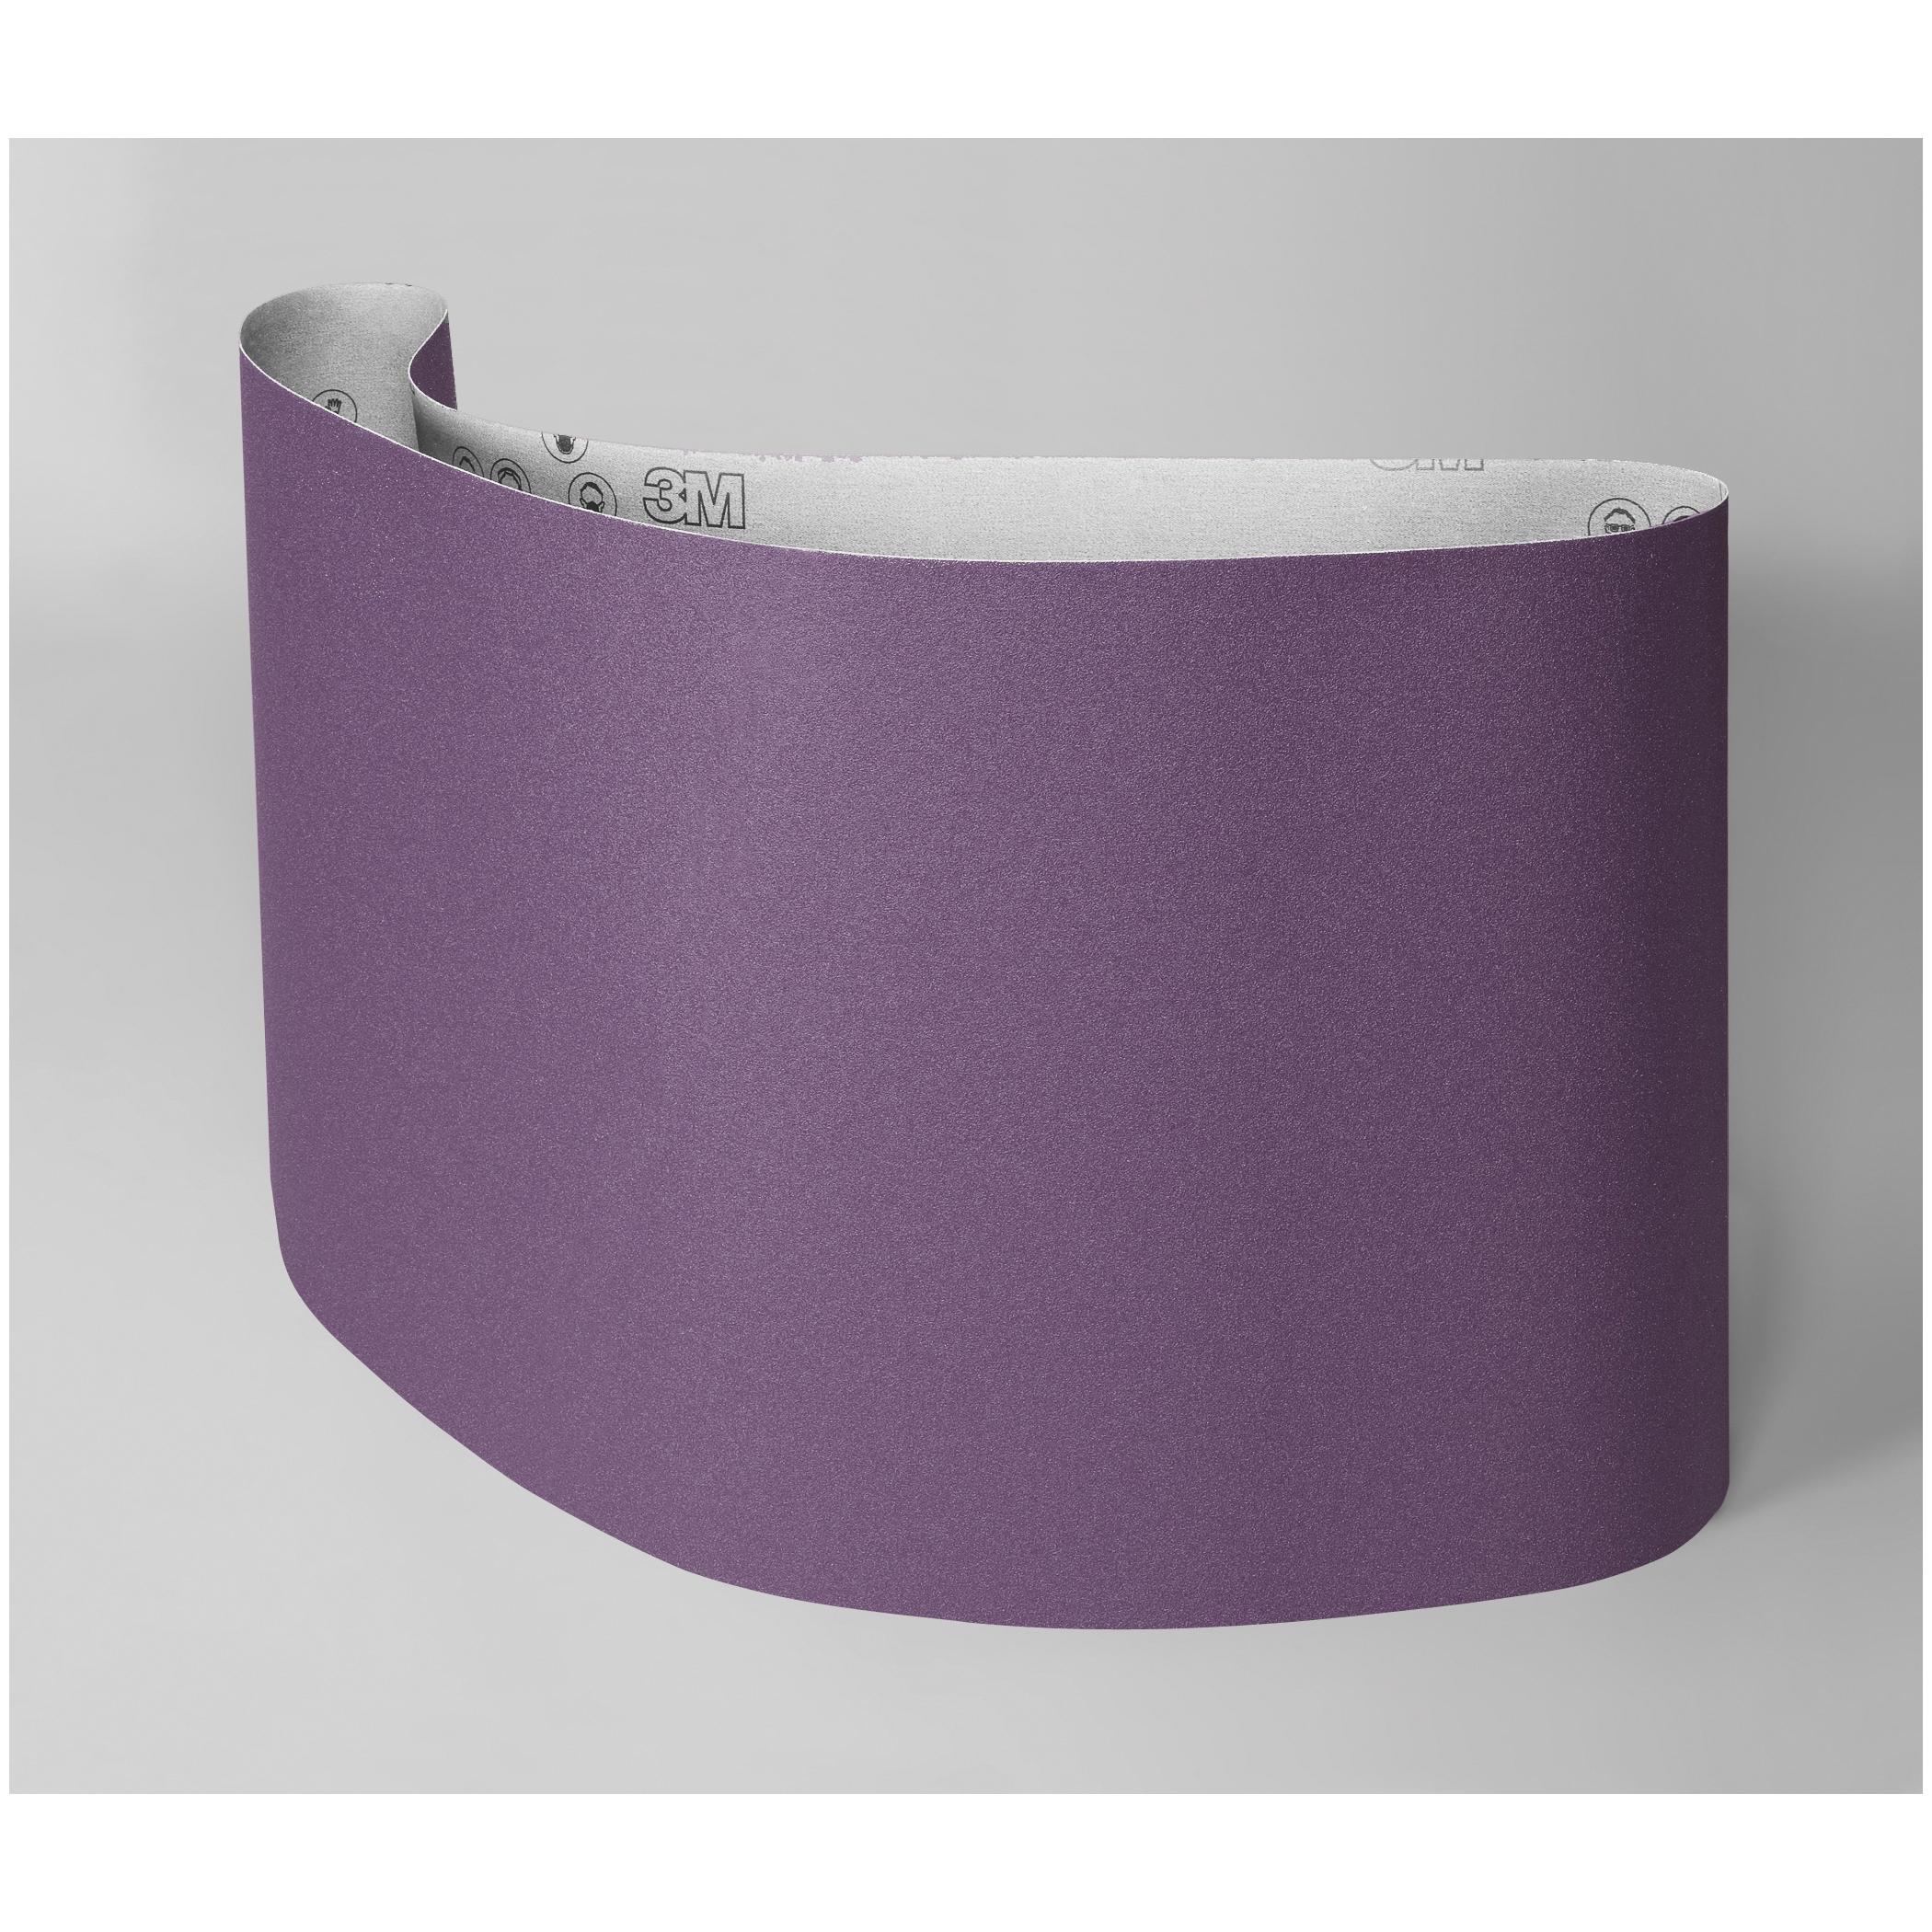 3M™ 051115-27397 Narrow Coated Abrasive Belt, 12 in W x 226 in L, 80 Grit, Medium Grade, Ceramic Abrasive, Cloth Backing